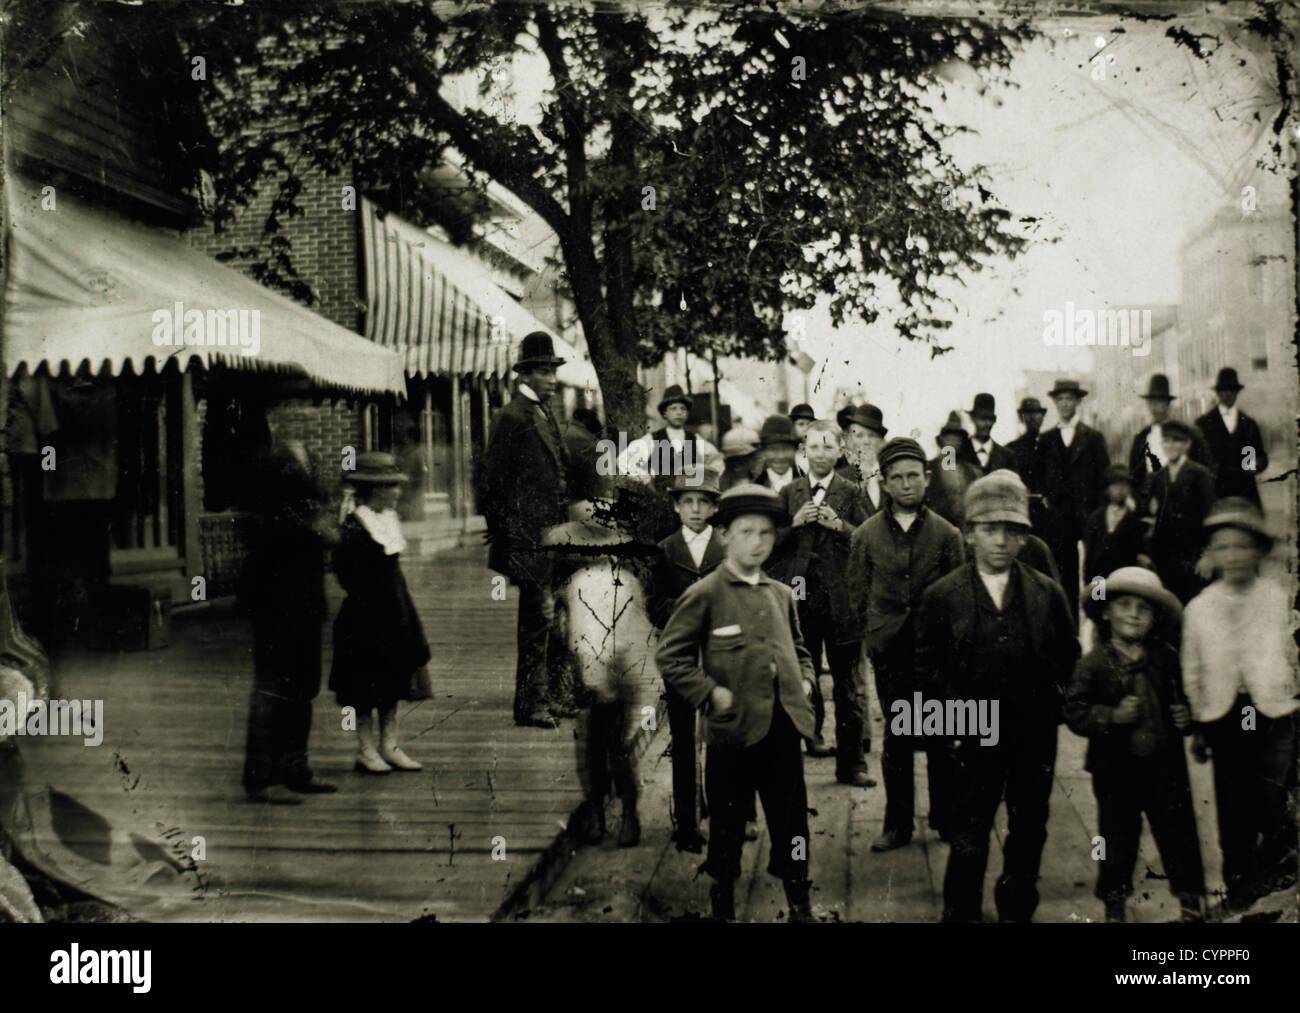 Crowd in Street, USA, circa 1900 - Stock Image